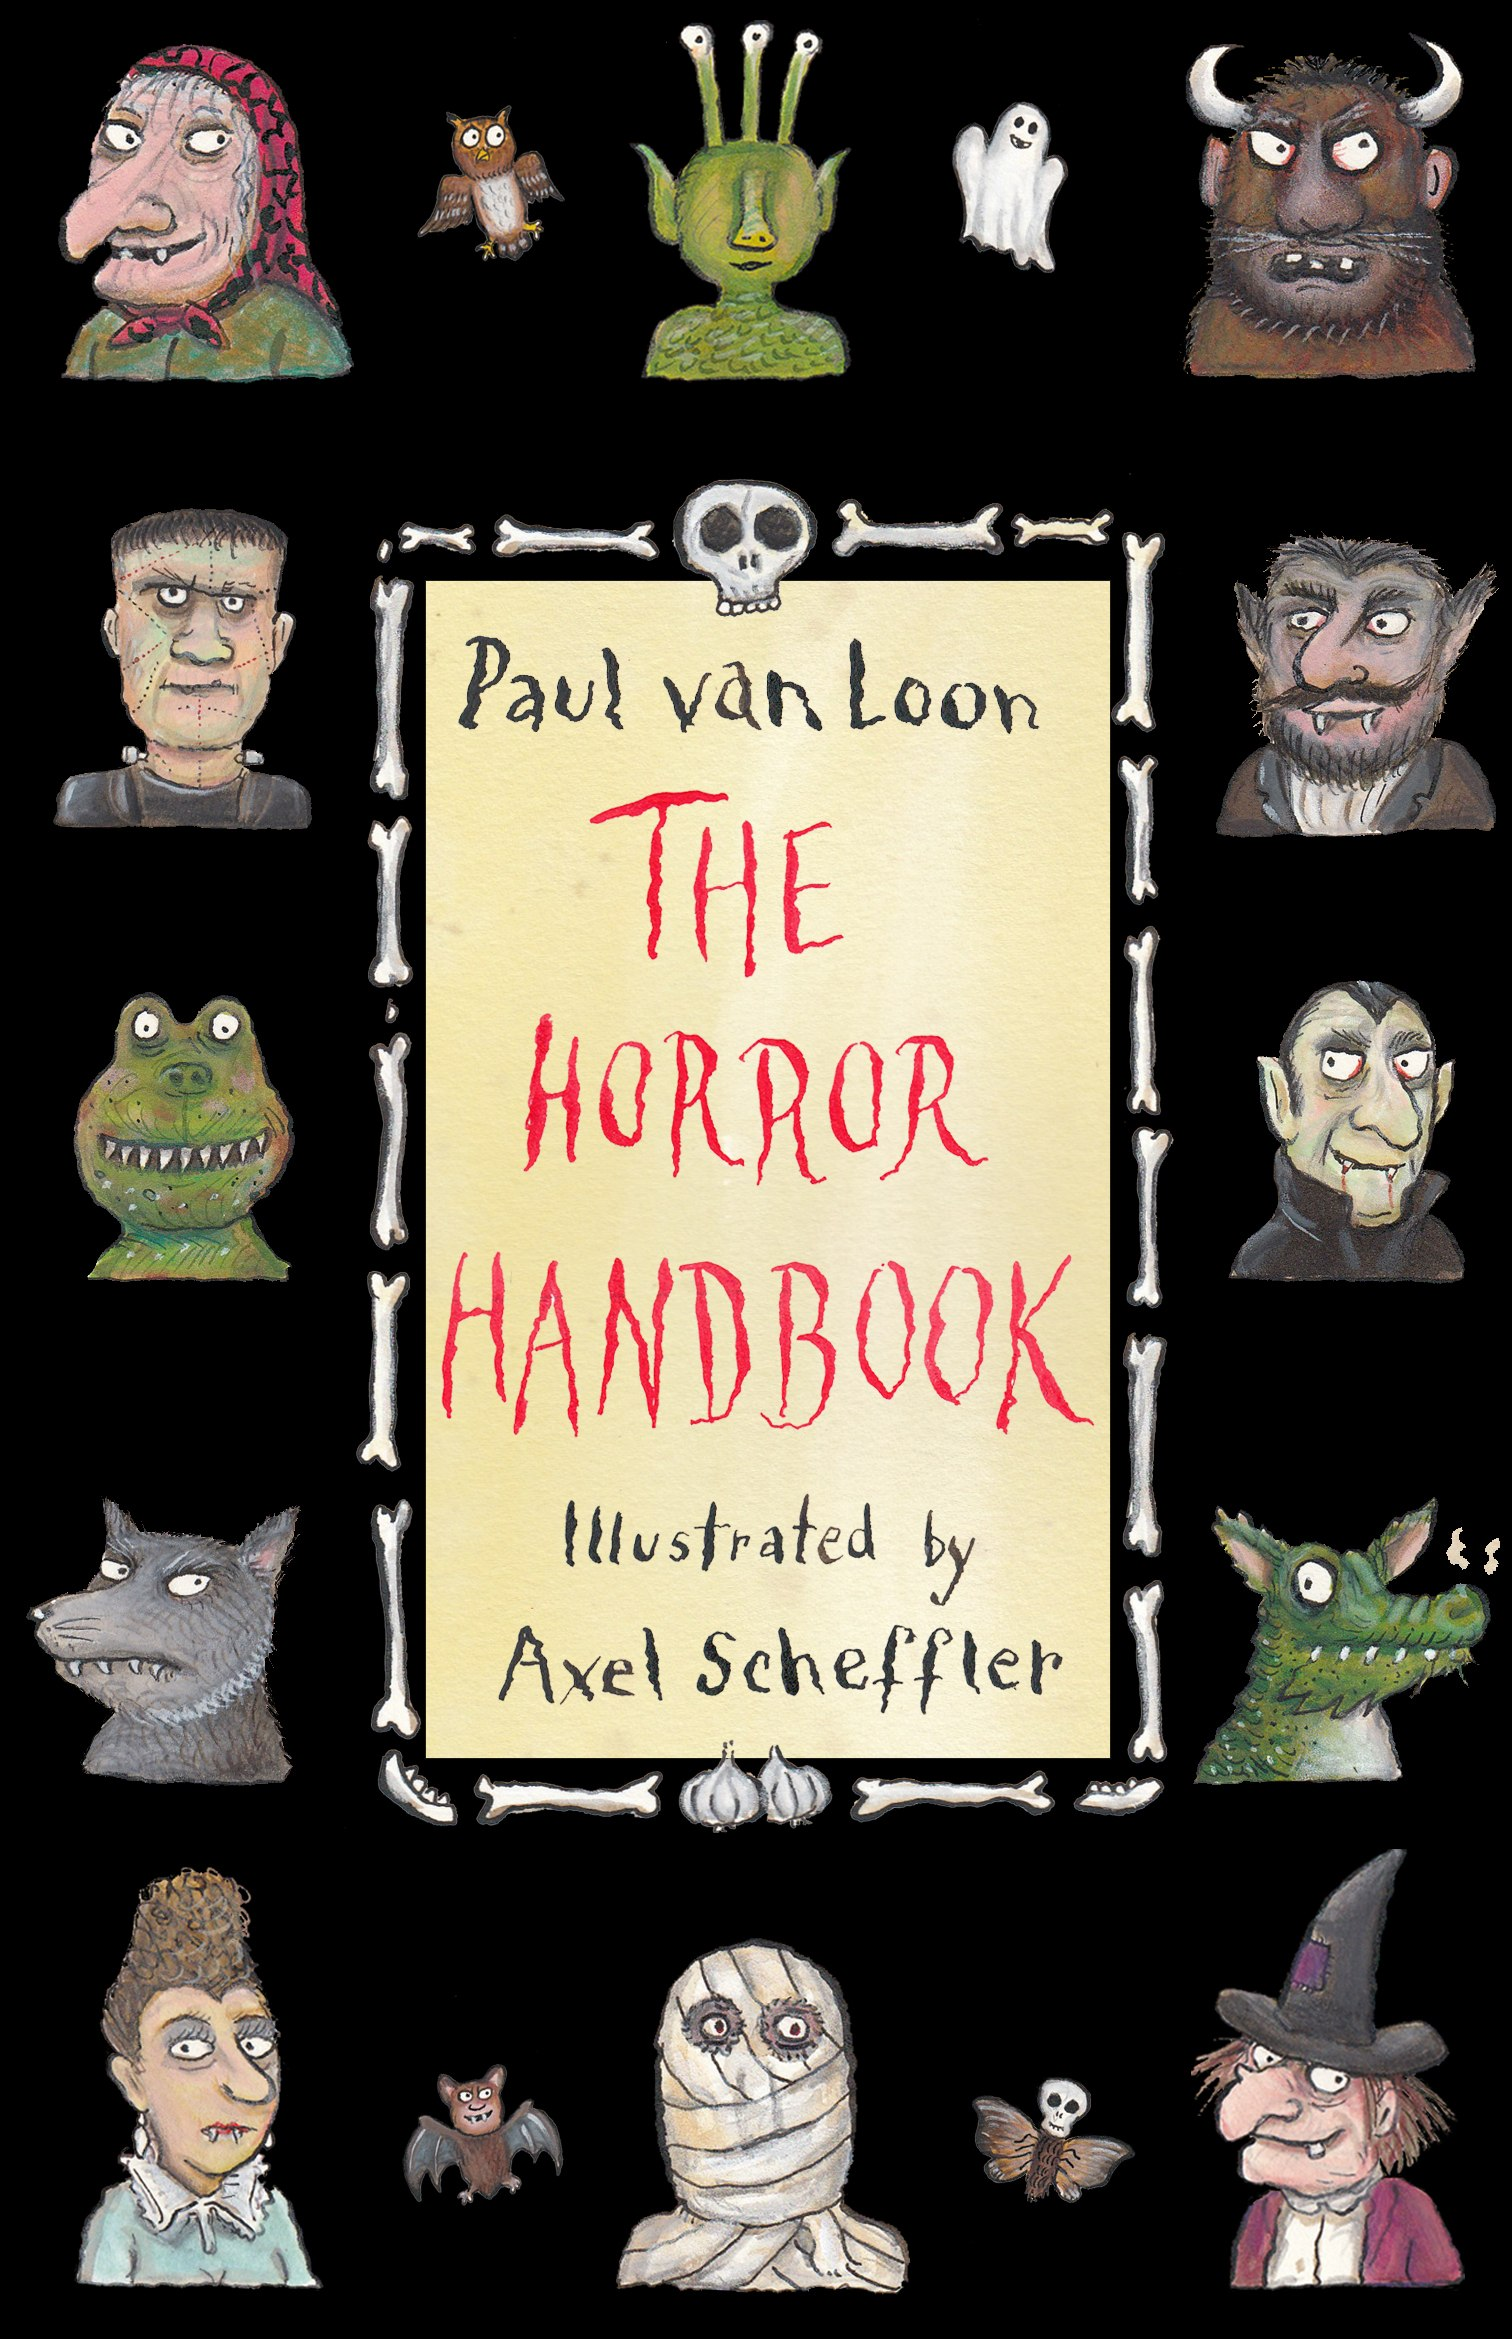 The horror handbook alma books see inside solutioingenieria Choice Image